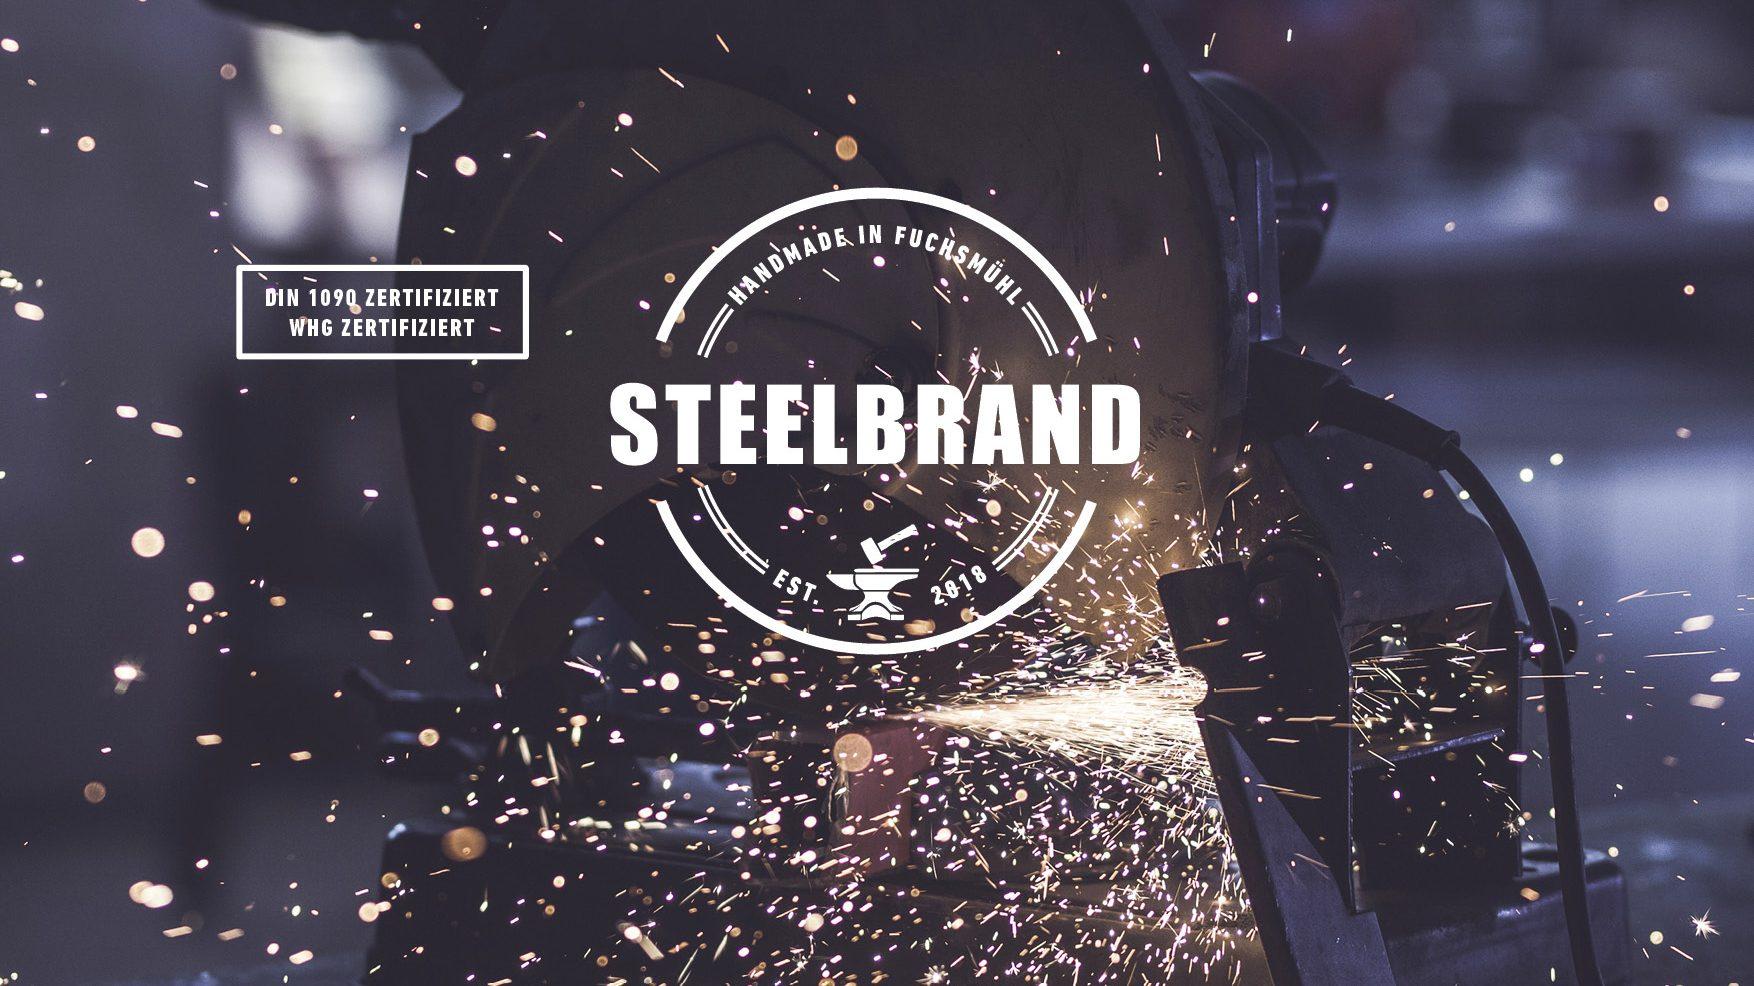 Steelbrand